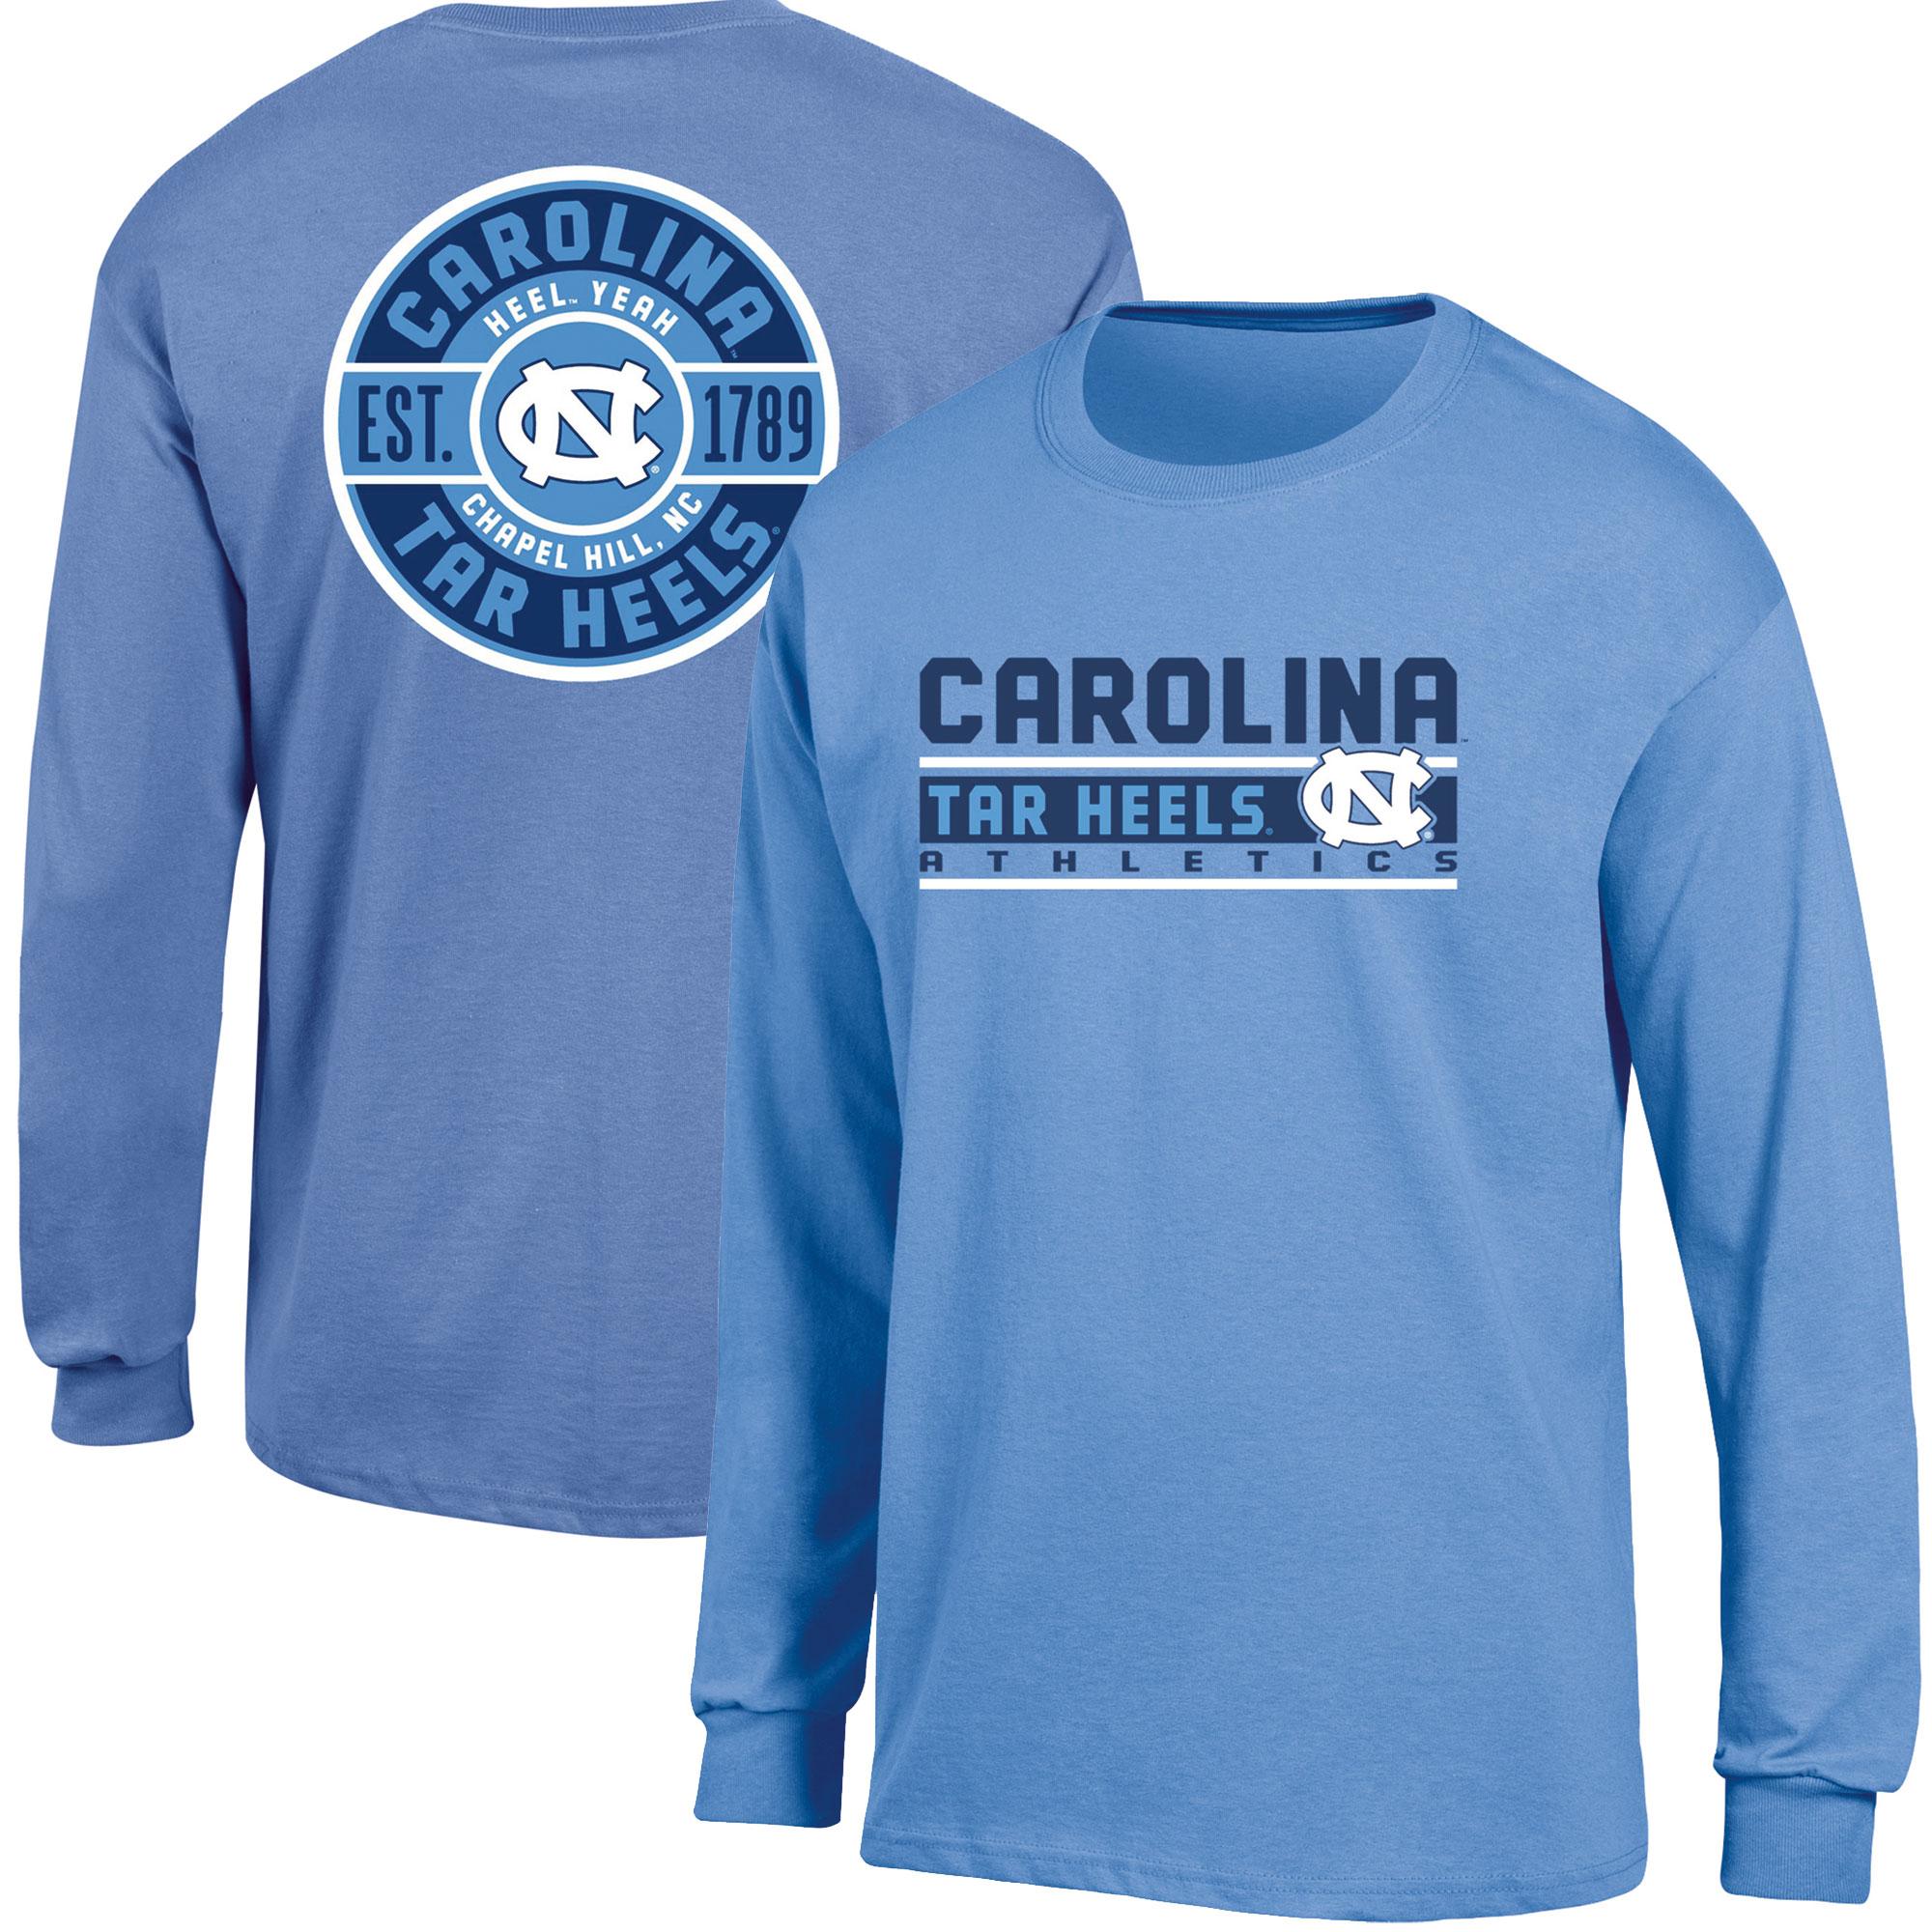 Men's Russell Carolina Blue North Carolina Tar Heels Back Hit Long Sleeve T-Shirt